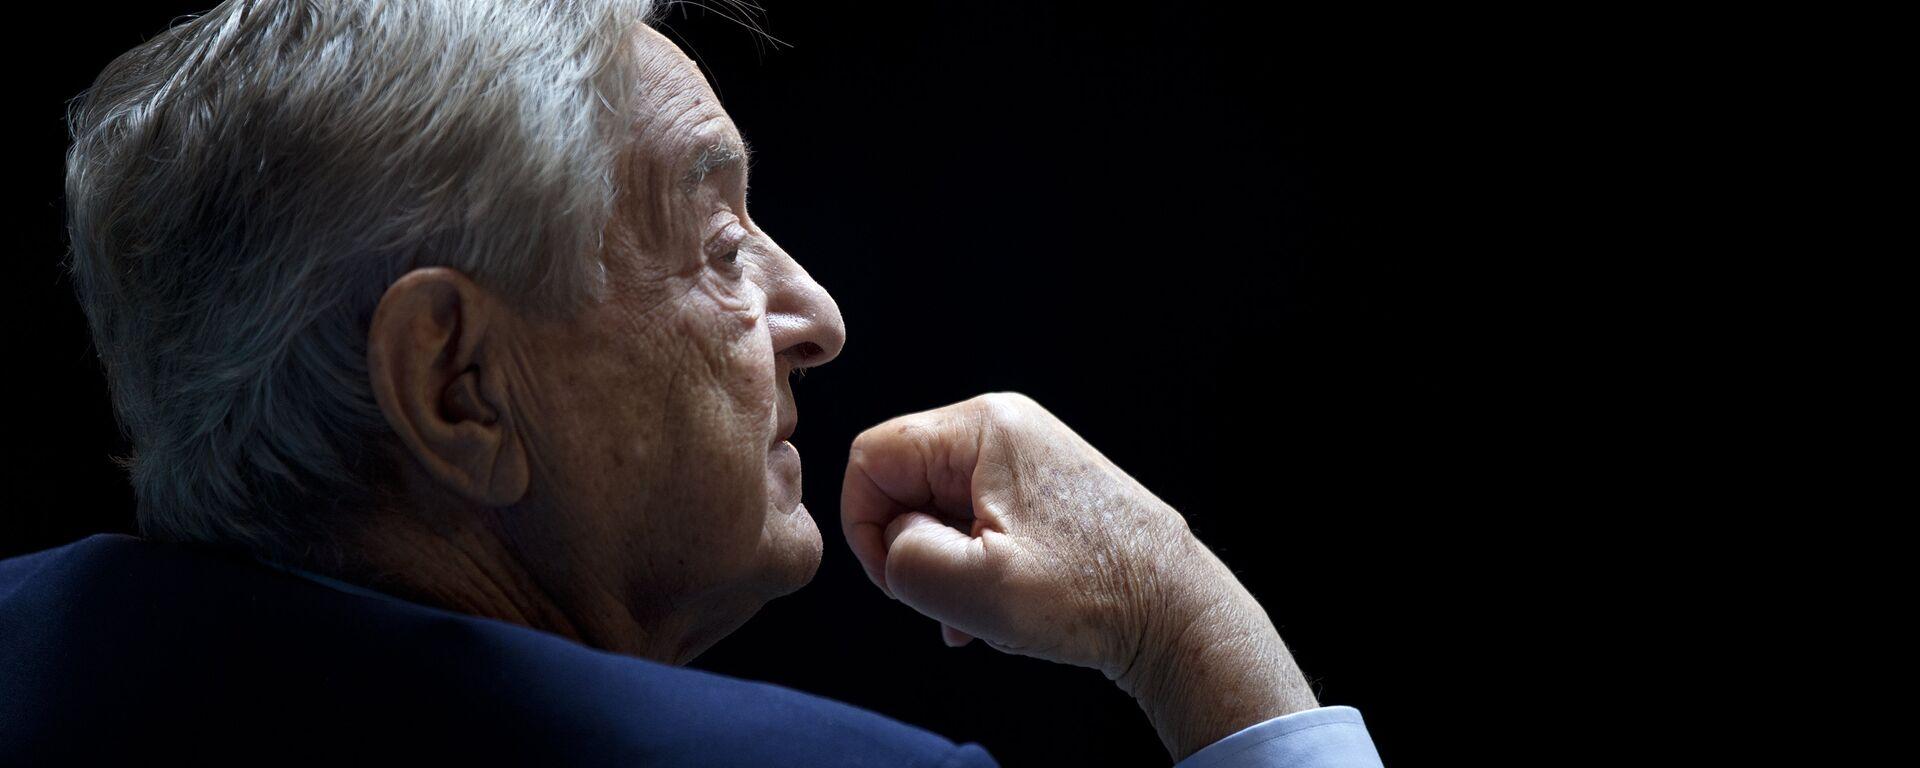 George Soros, multimillonario estadounidense - Sputnik Mundo, 1920, 08.09.2021